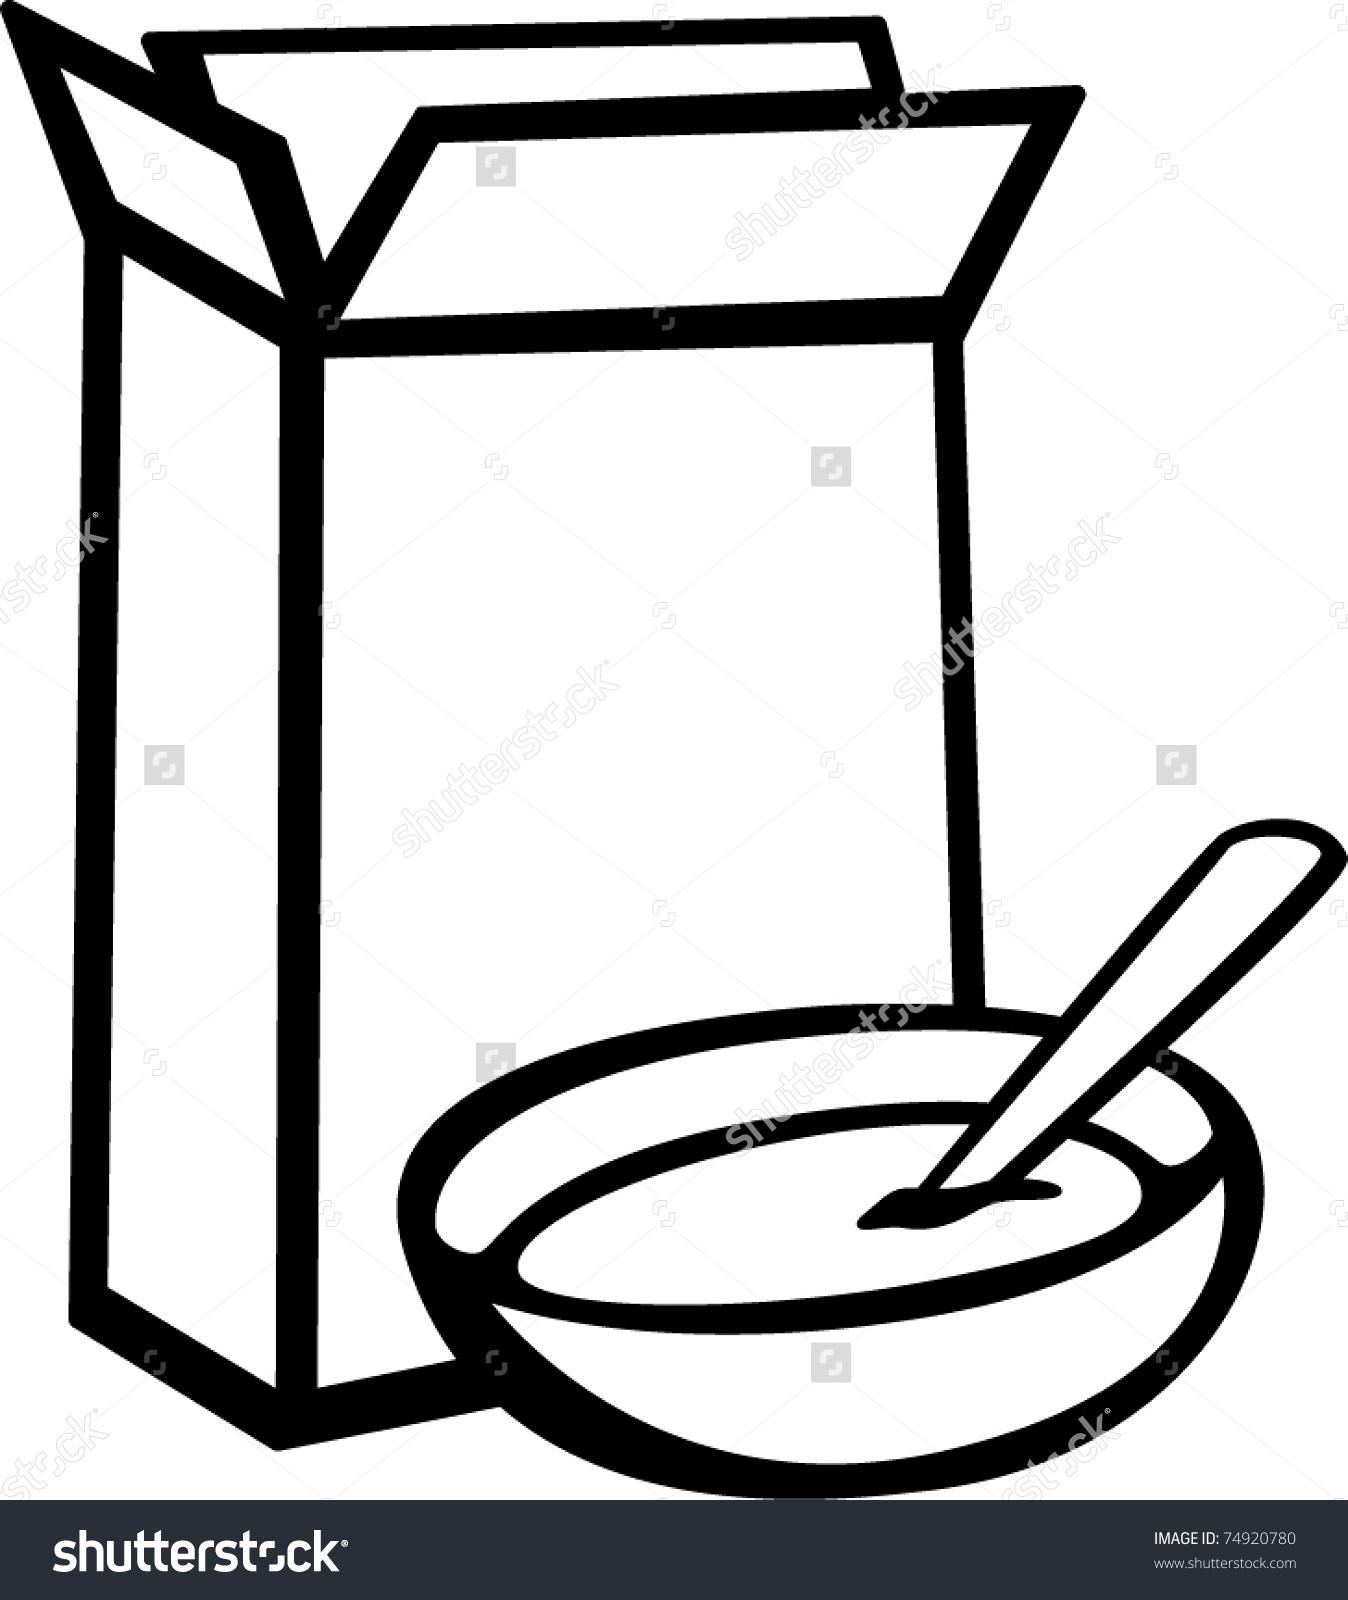 #7 Cereal Box Clip Art And ..-#7 Cereal Box Clip Art And ..-17